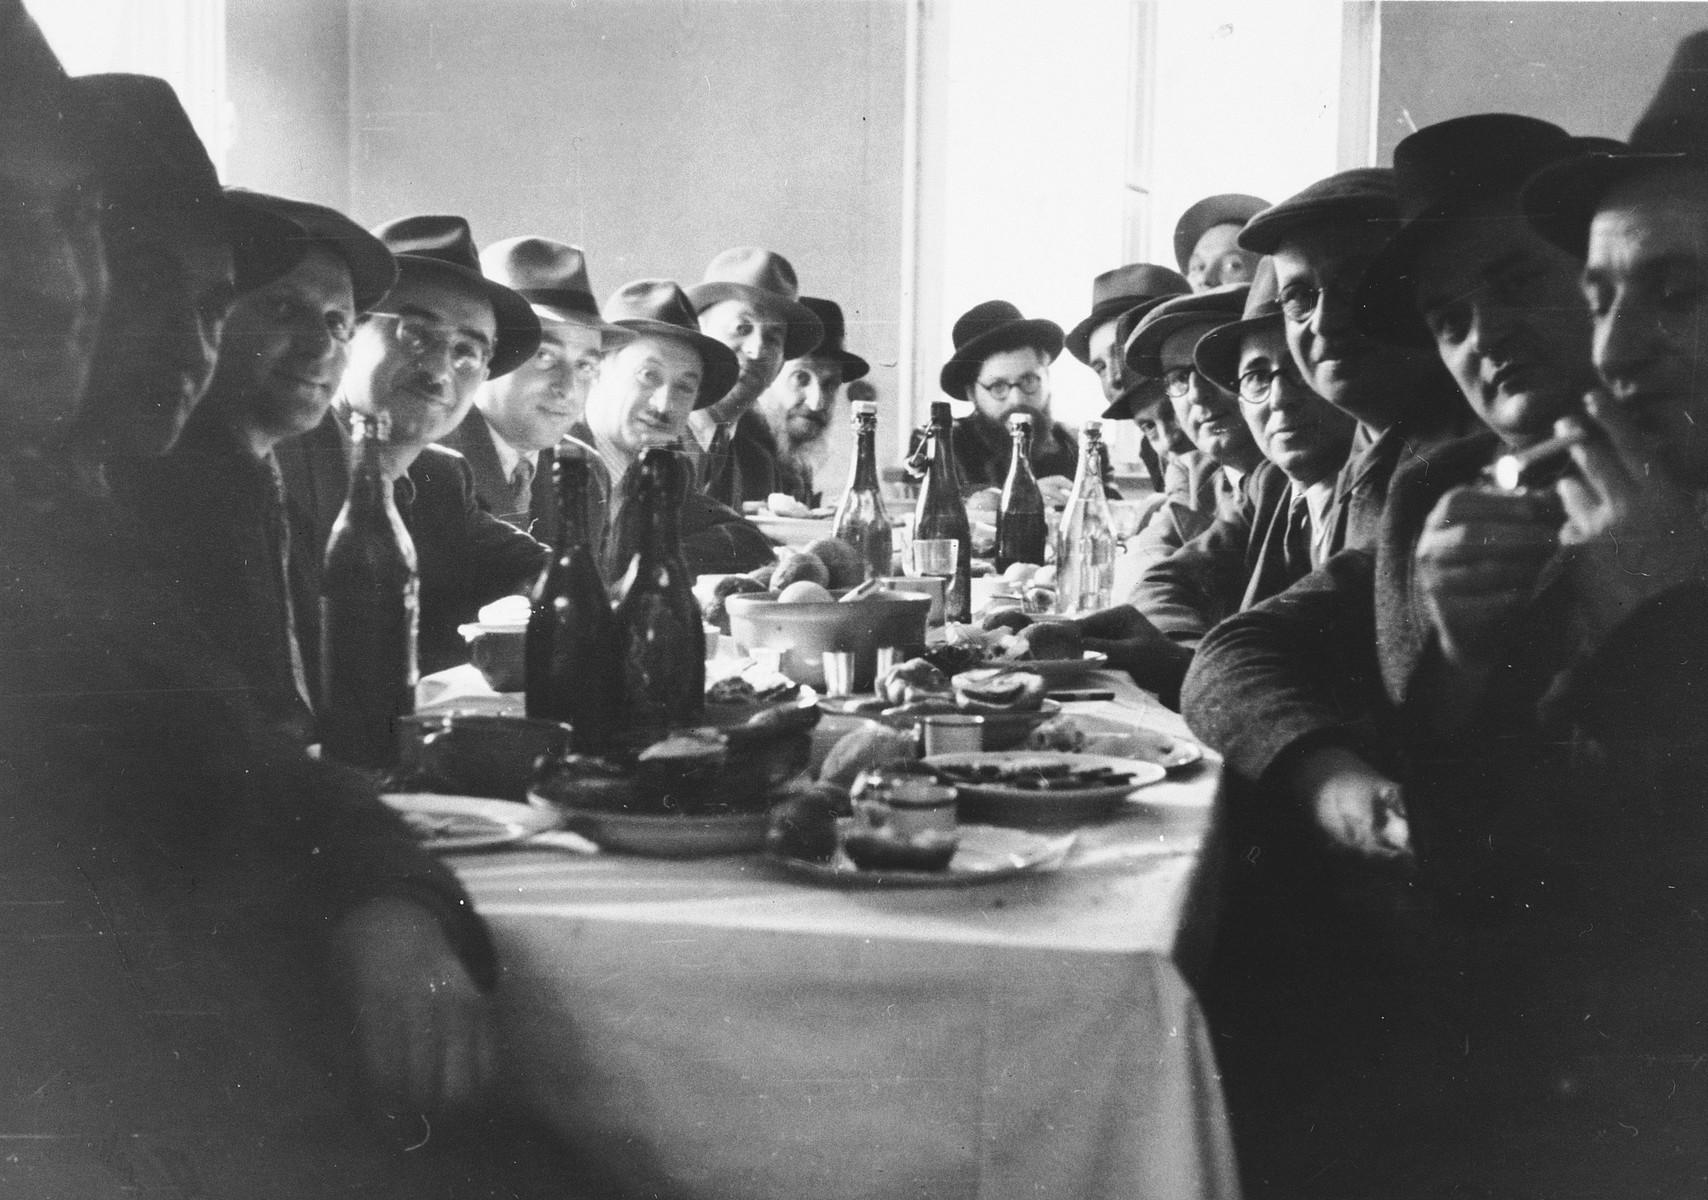 Jewish men celebrate a brit milah (circumcision) in the Wasseralfingen displaced persons' camp.